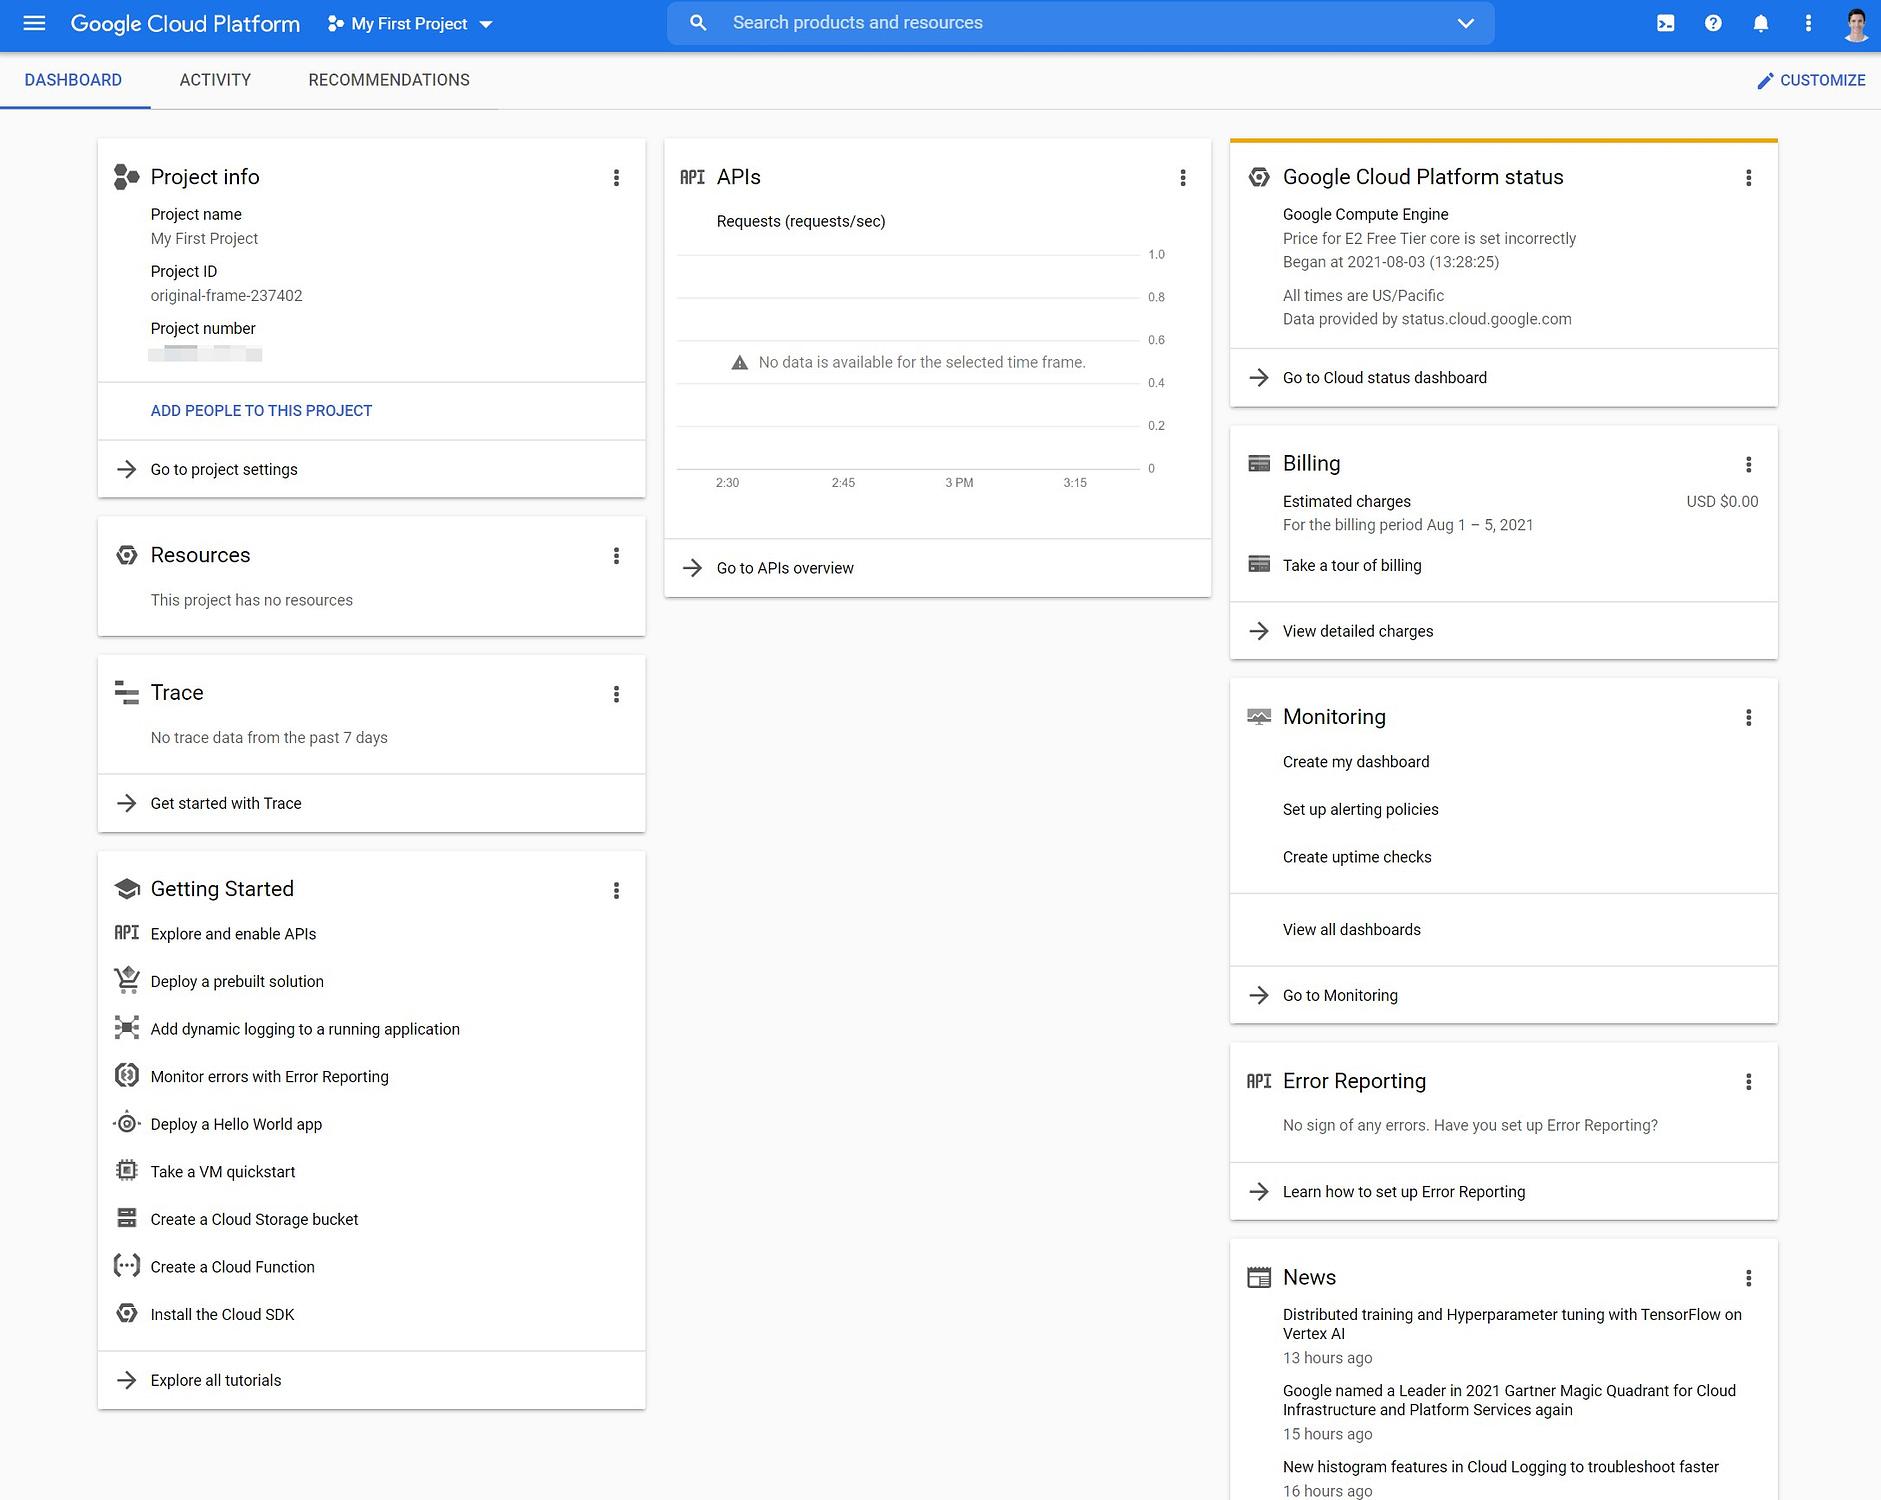 Google Cloud dashboard vs AWS